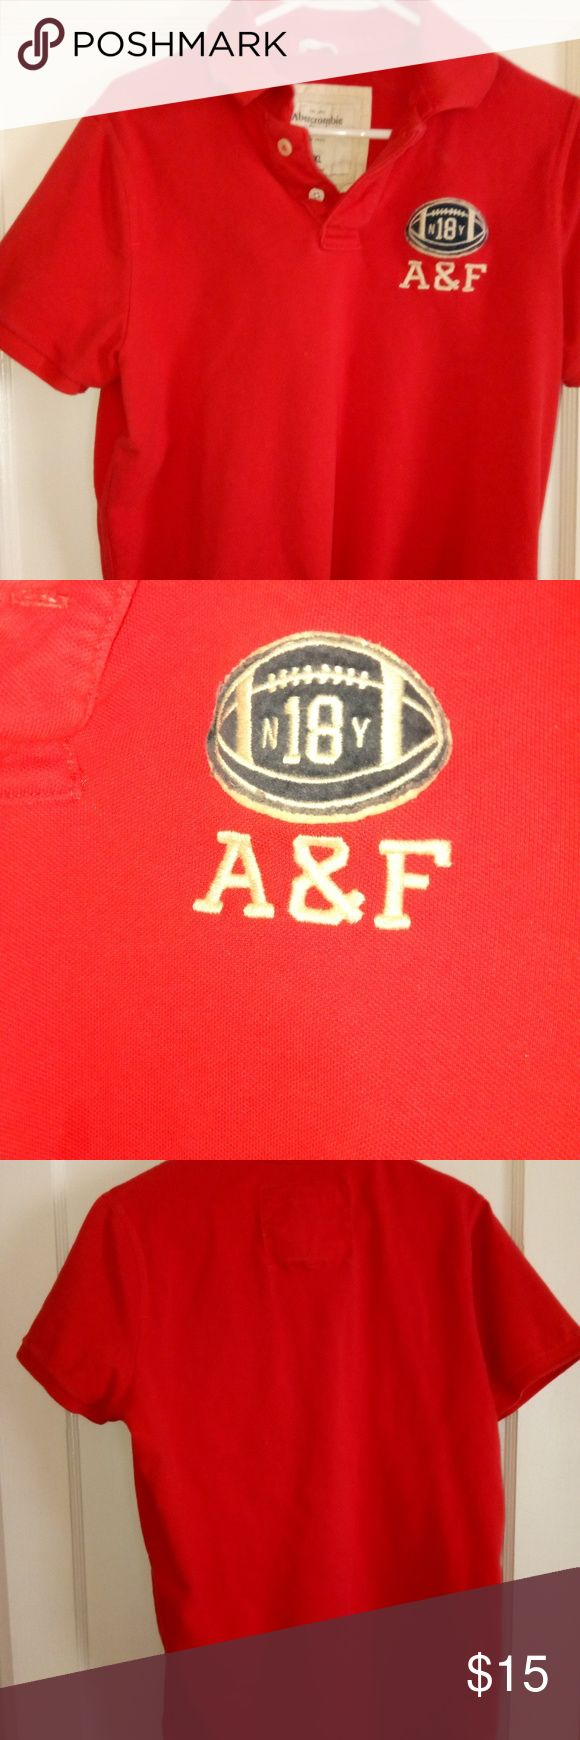 Mens xxl muscle shirt Men's reddish orange  Abercrombie muscle shirt euc Abercrombie & Fitch Shirts Polos